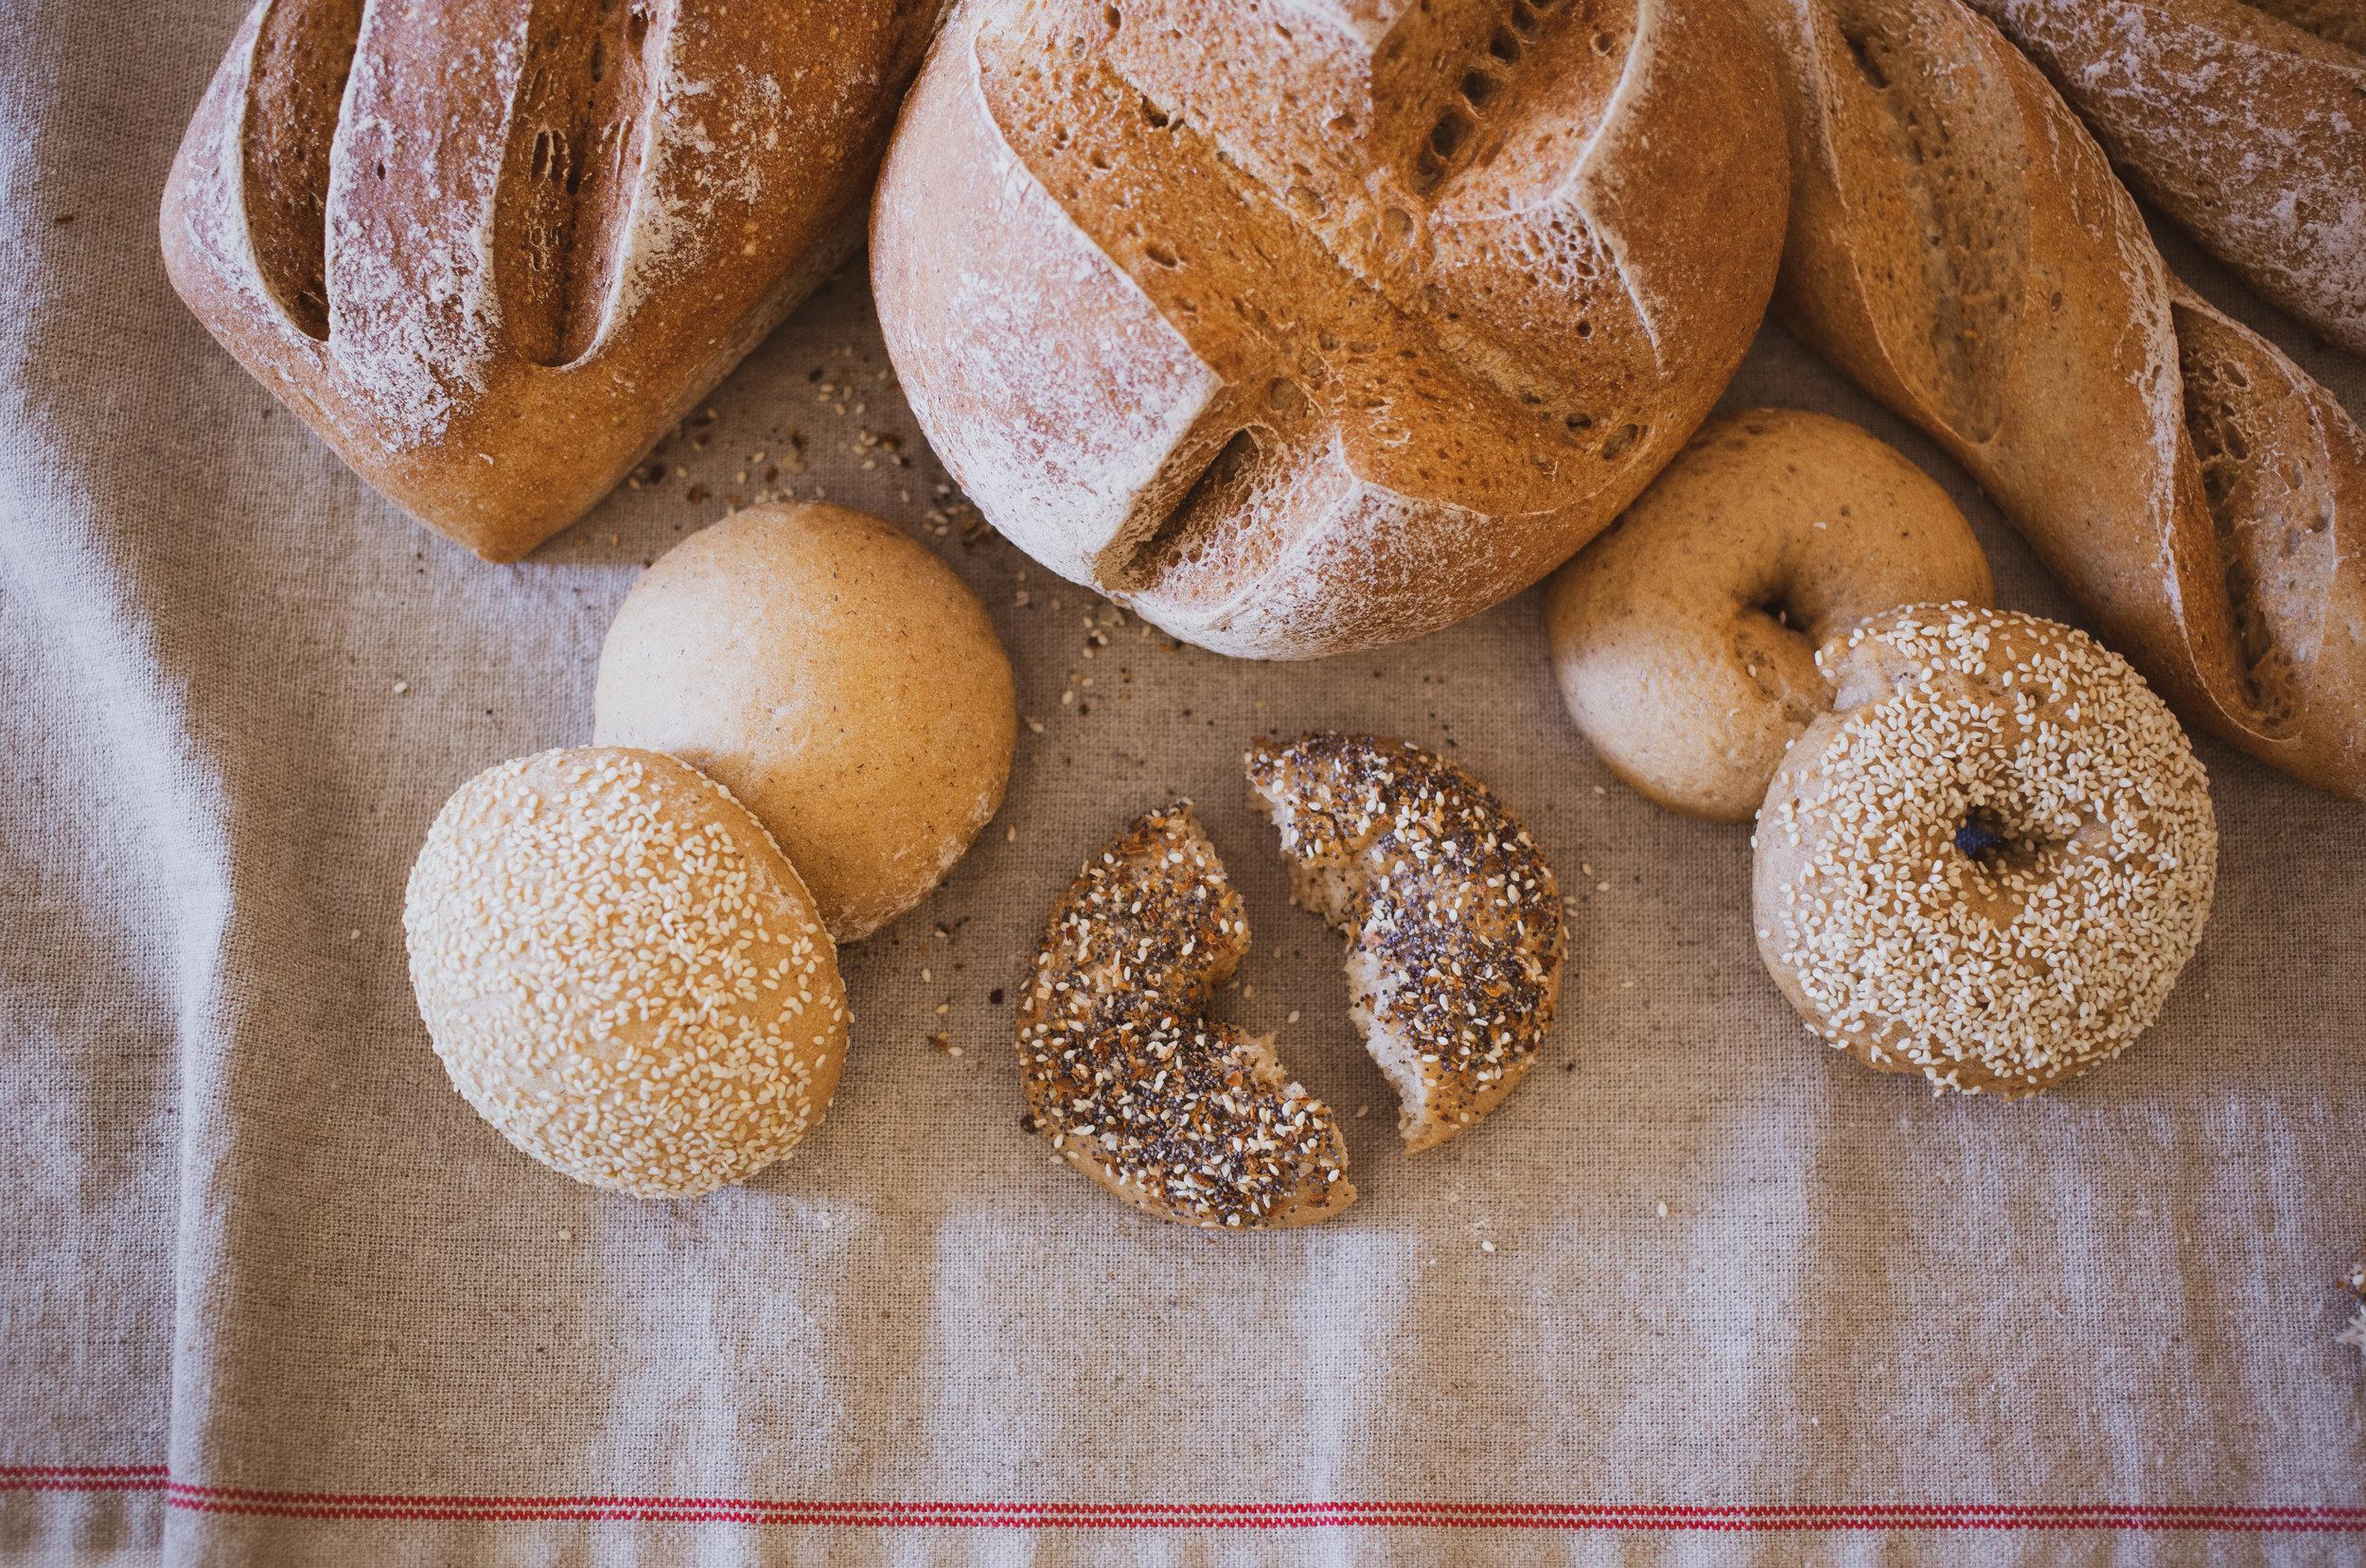 Artisanal Bread Reinvented